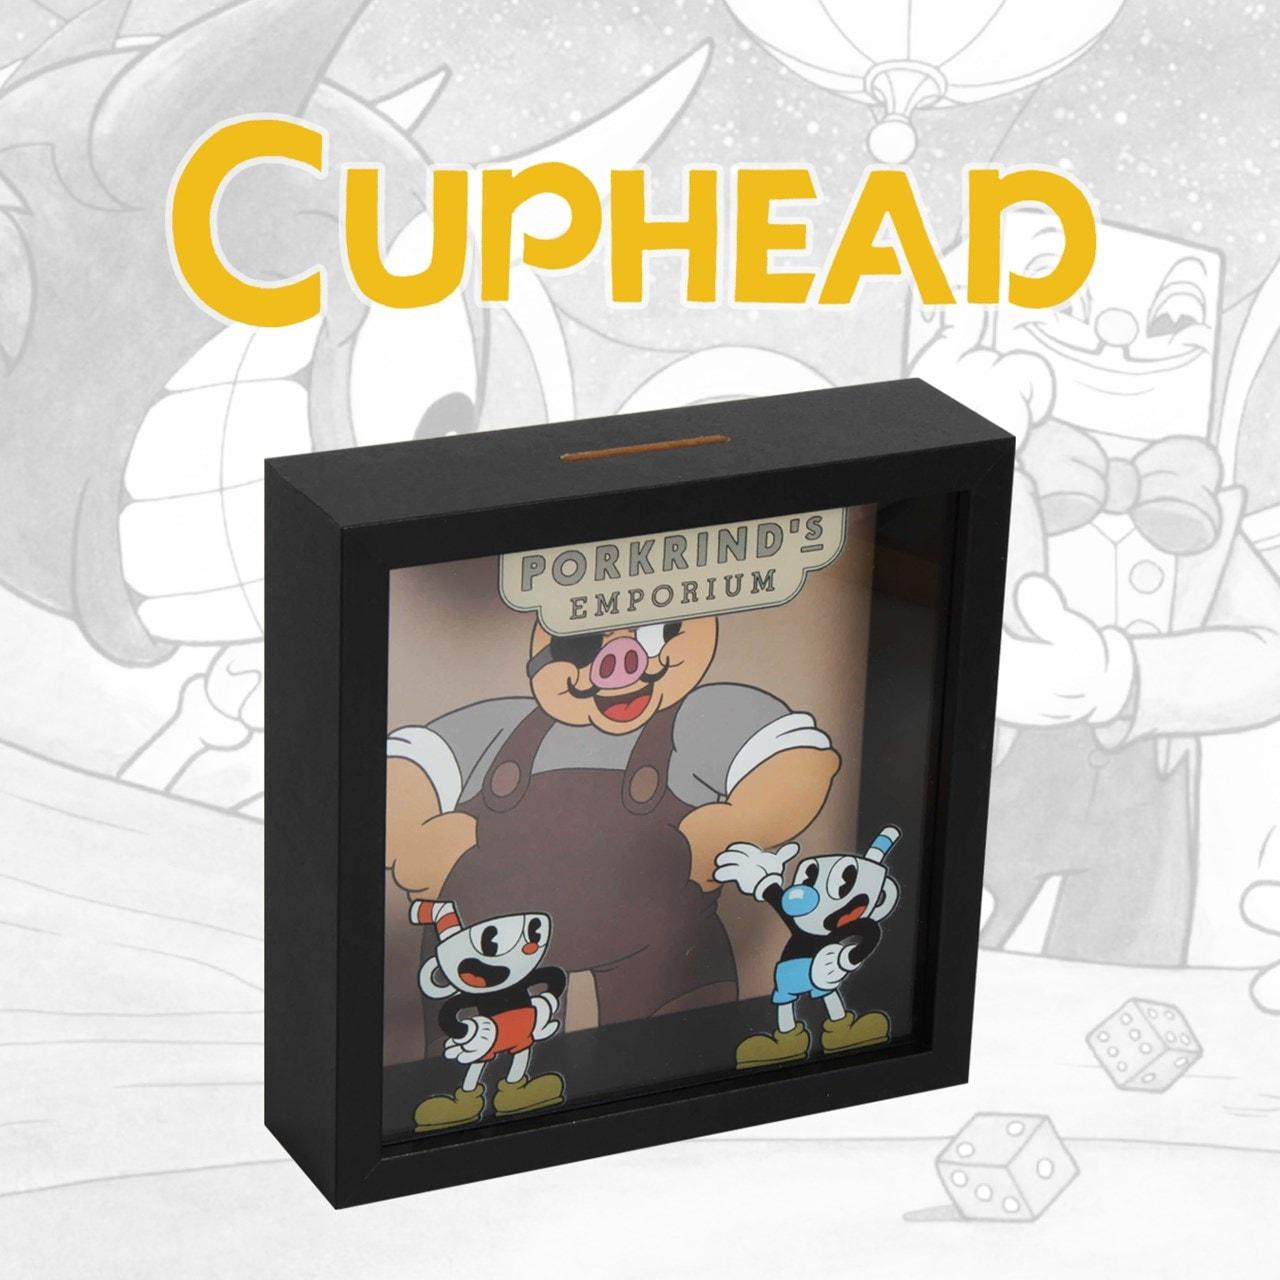 Cuphead Money Box - 2